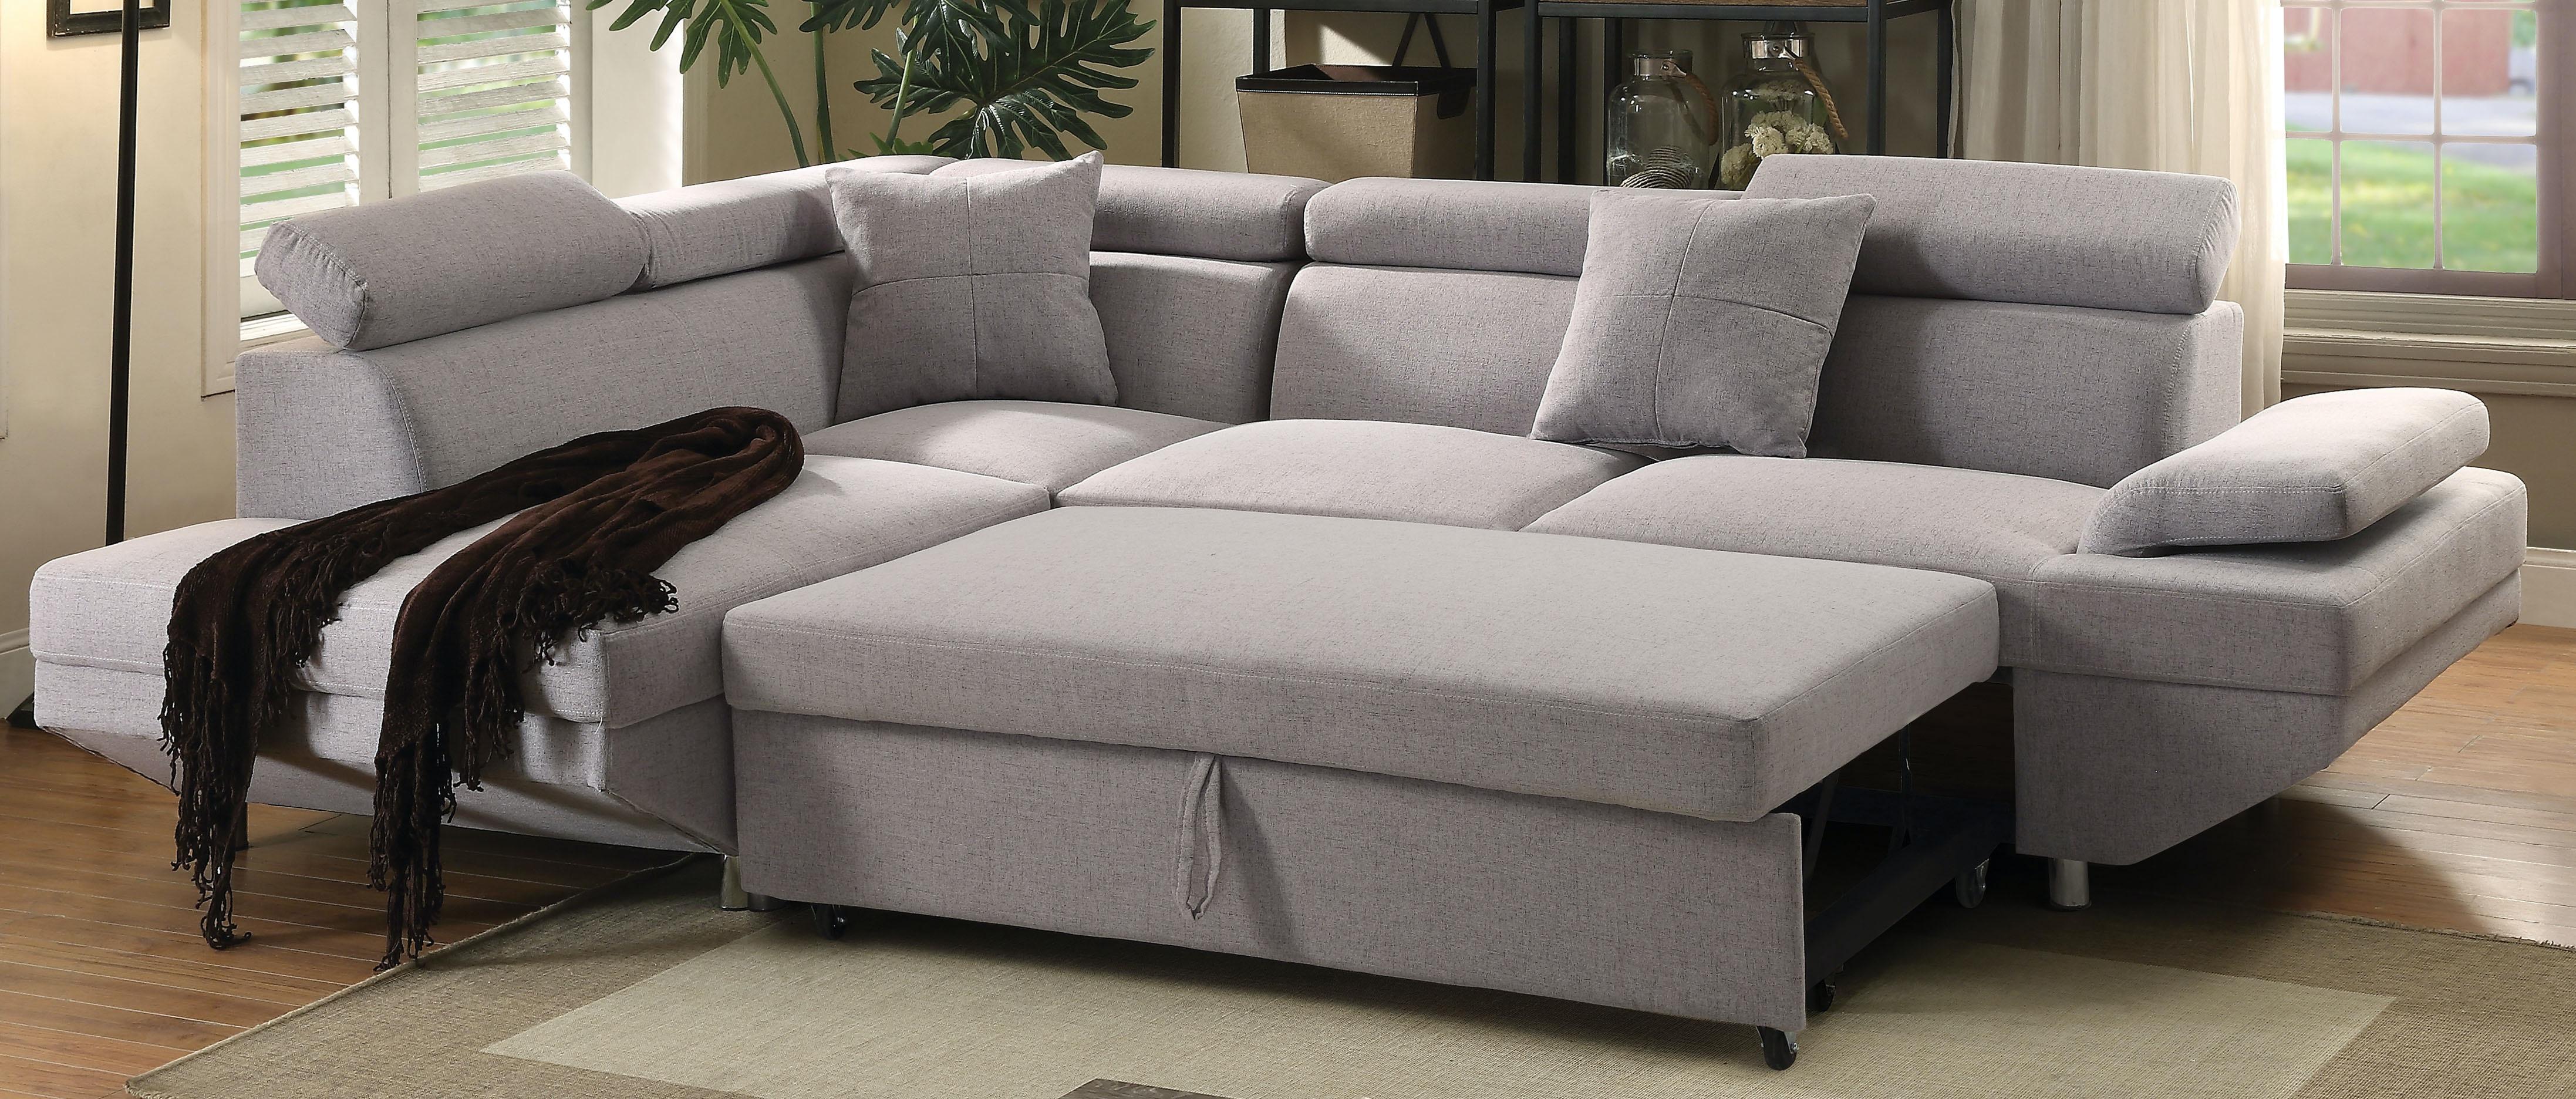 Acme Furniture Living Room Jemima Sectional Sofa with Sleeper